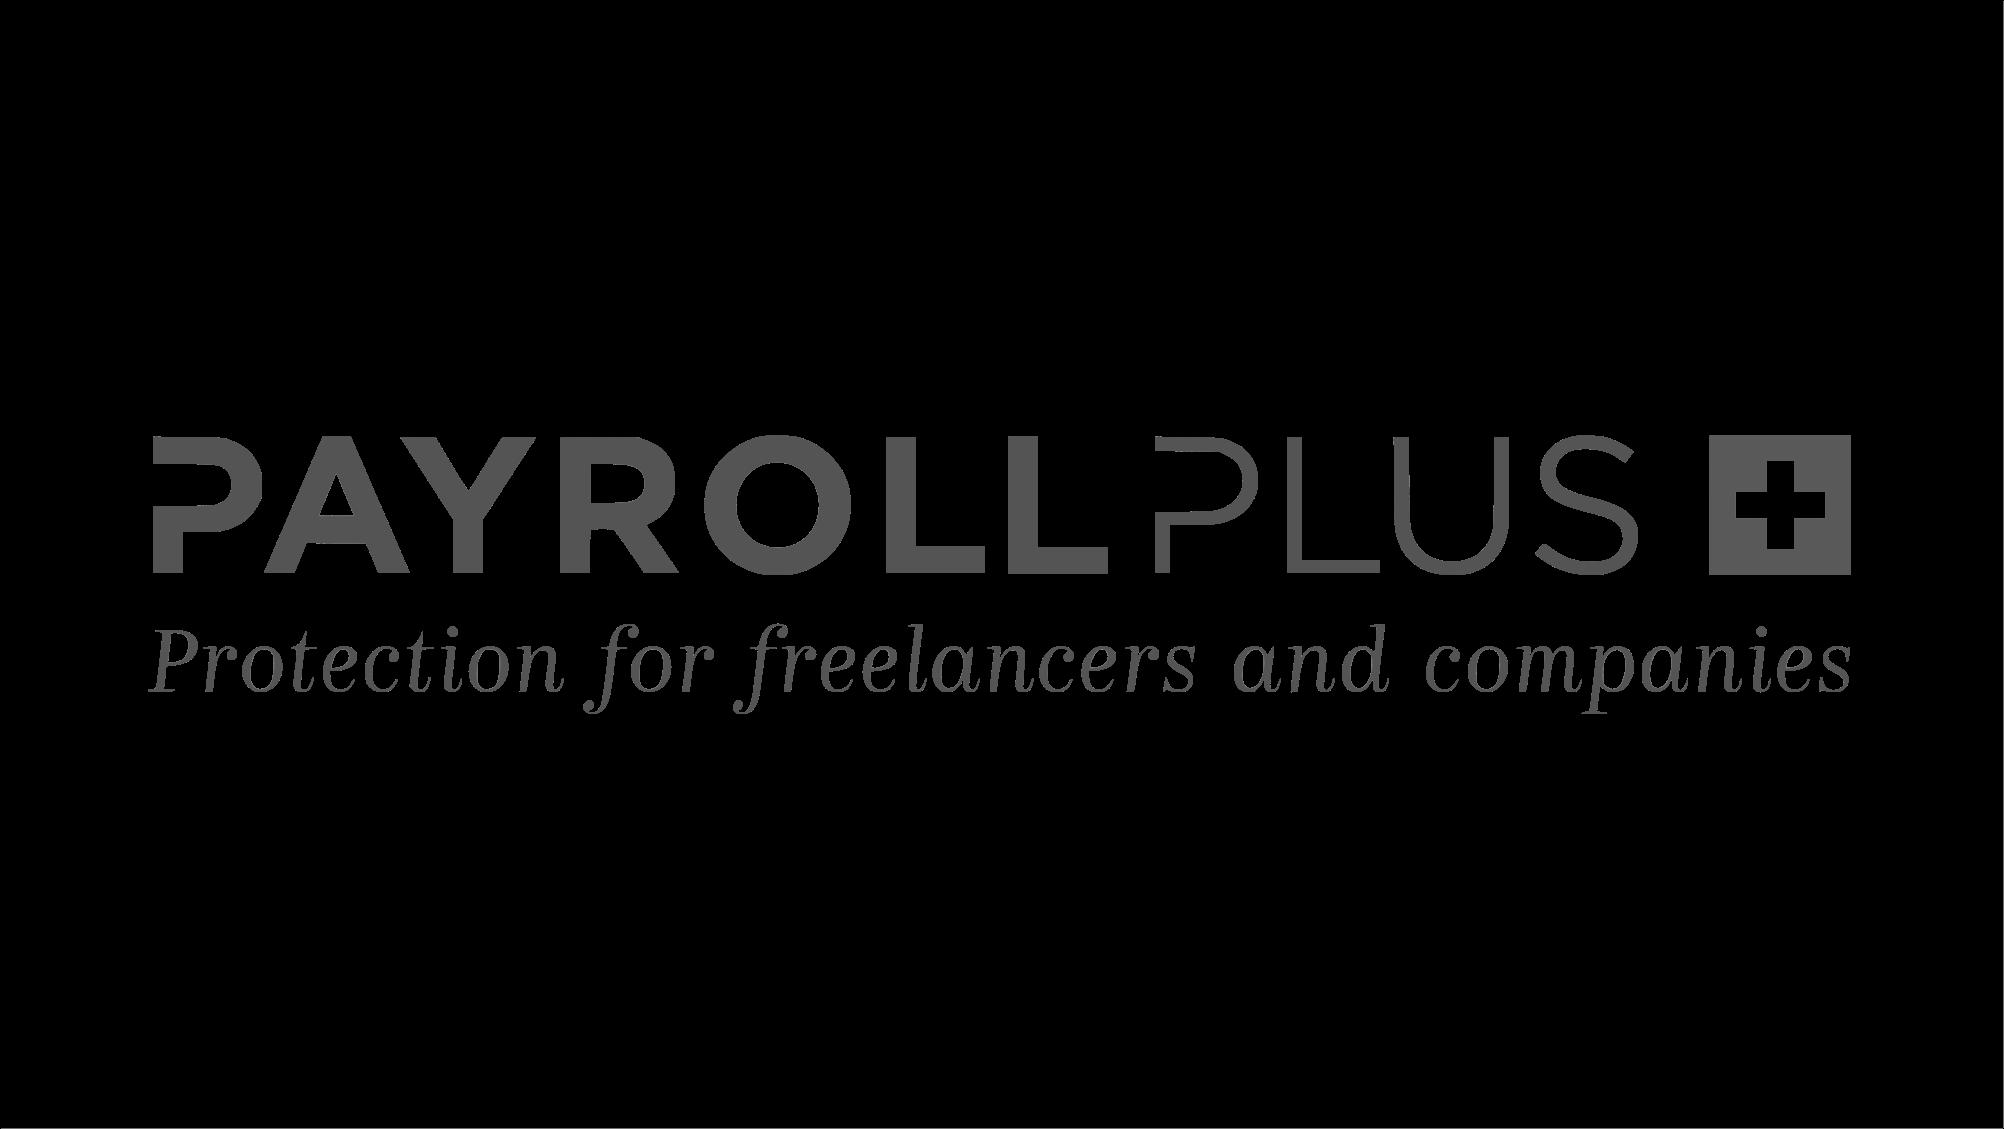 PayrollPlus